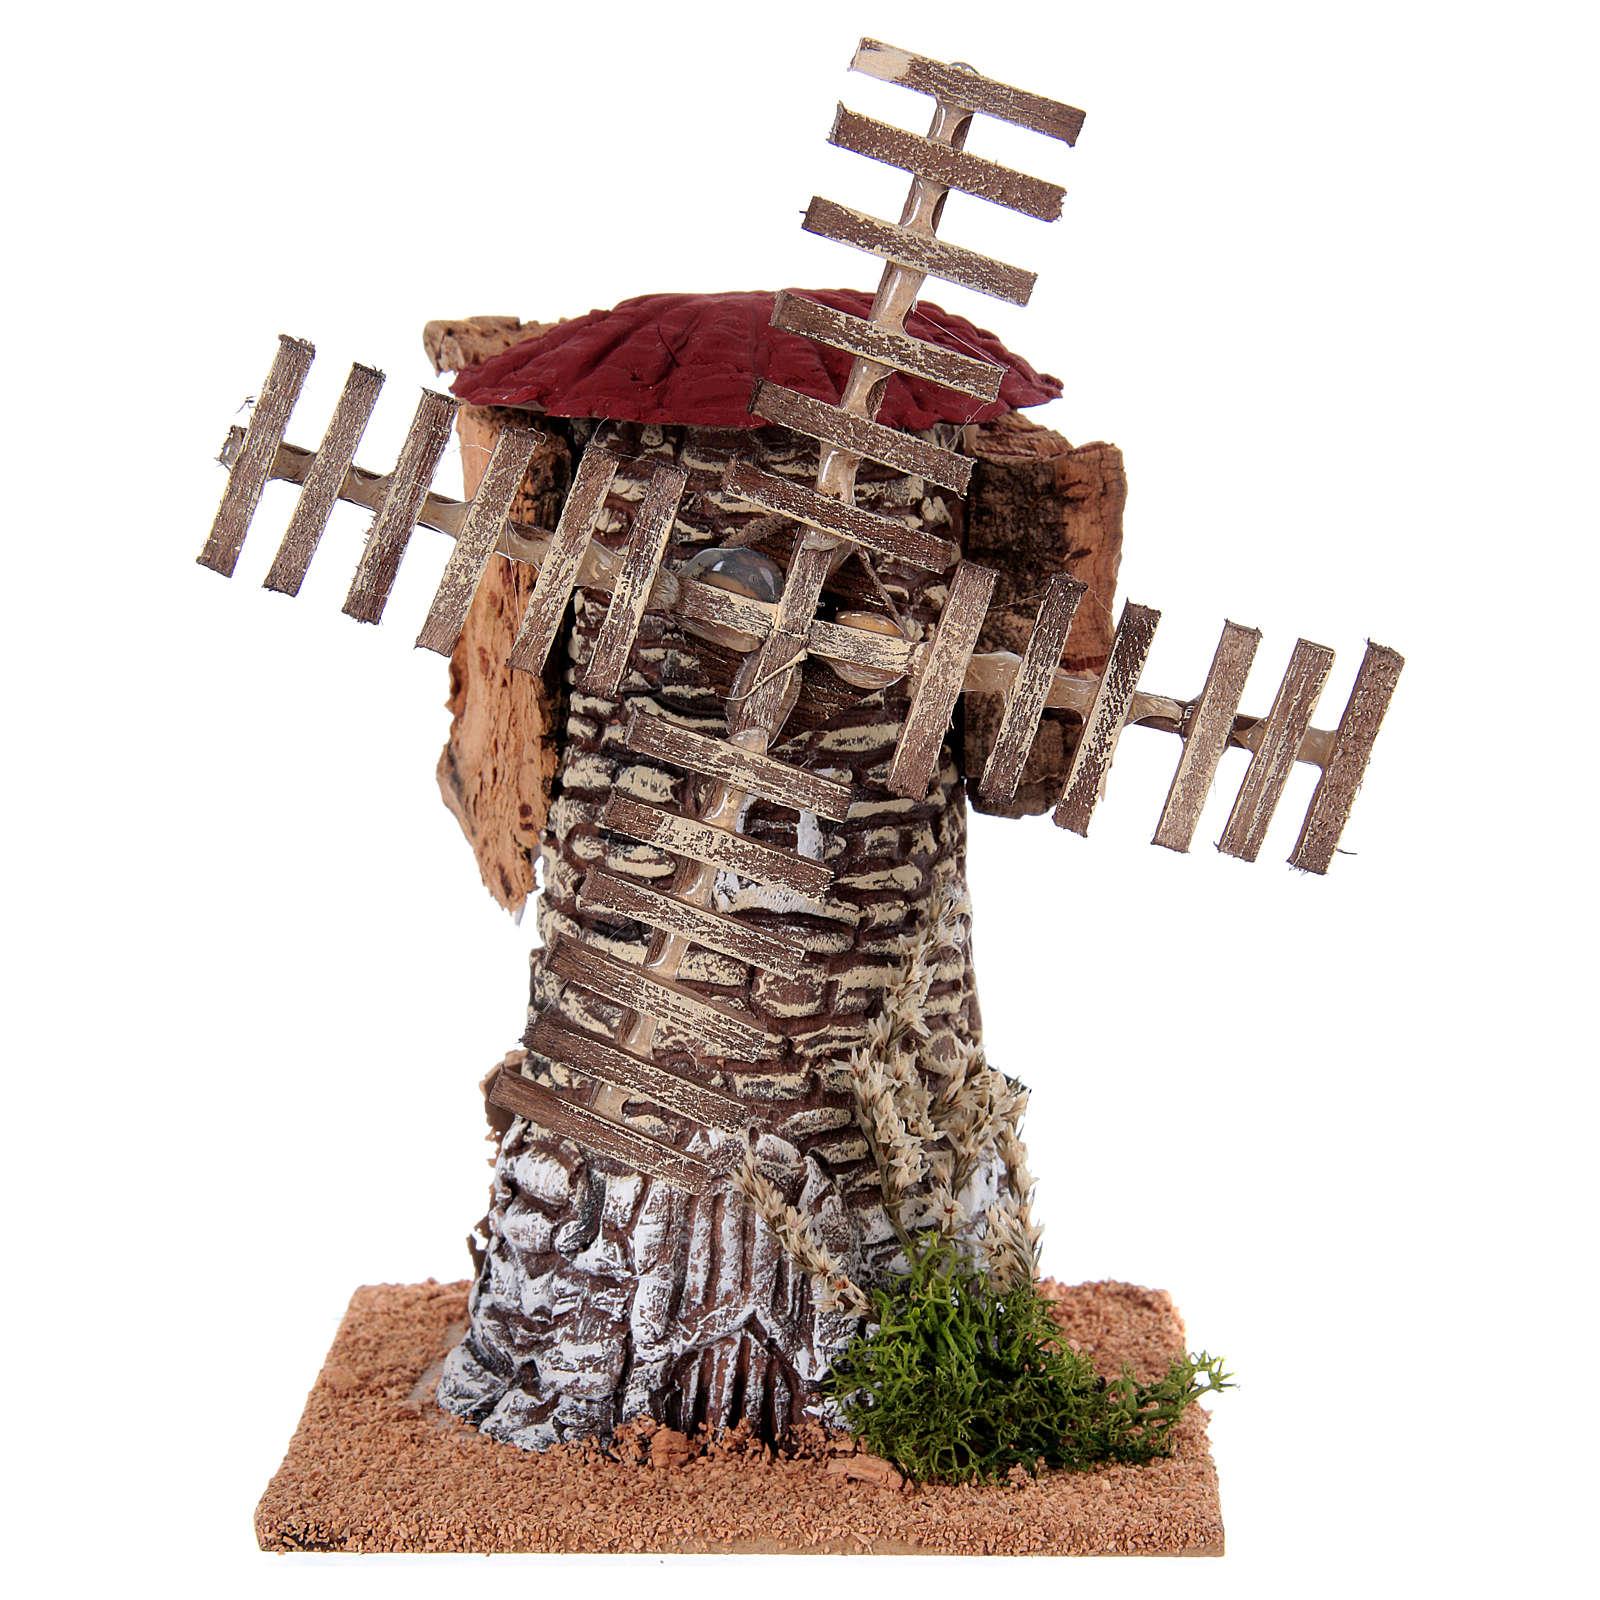 Mulino a vento terracotta 20x25x25 cm presepe 4